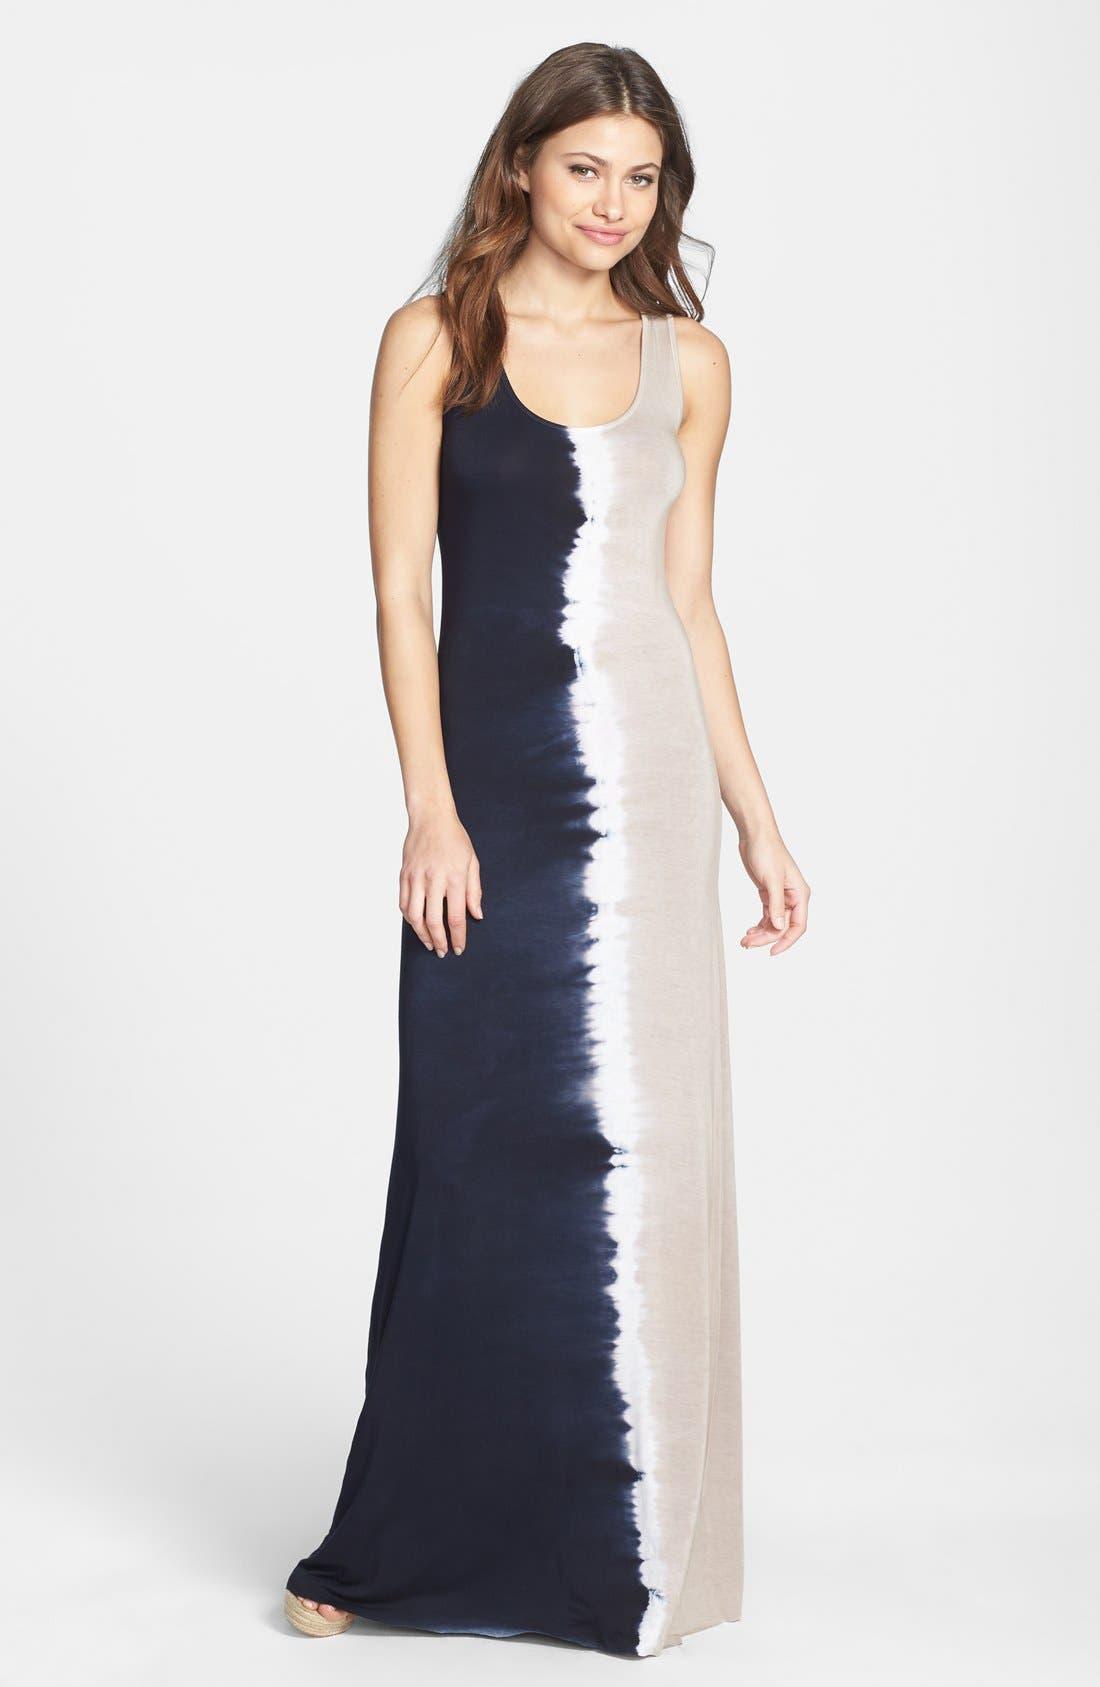 Main Image - Felicity & Coco Tie Dye Jersey Maxi Dress (Petite) (Nordstrom Exclusive)